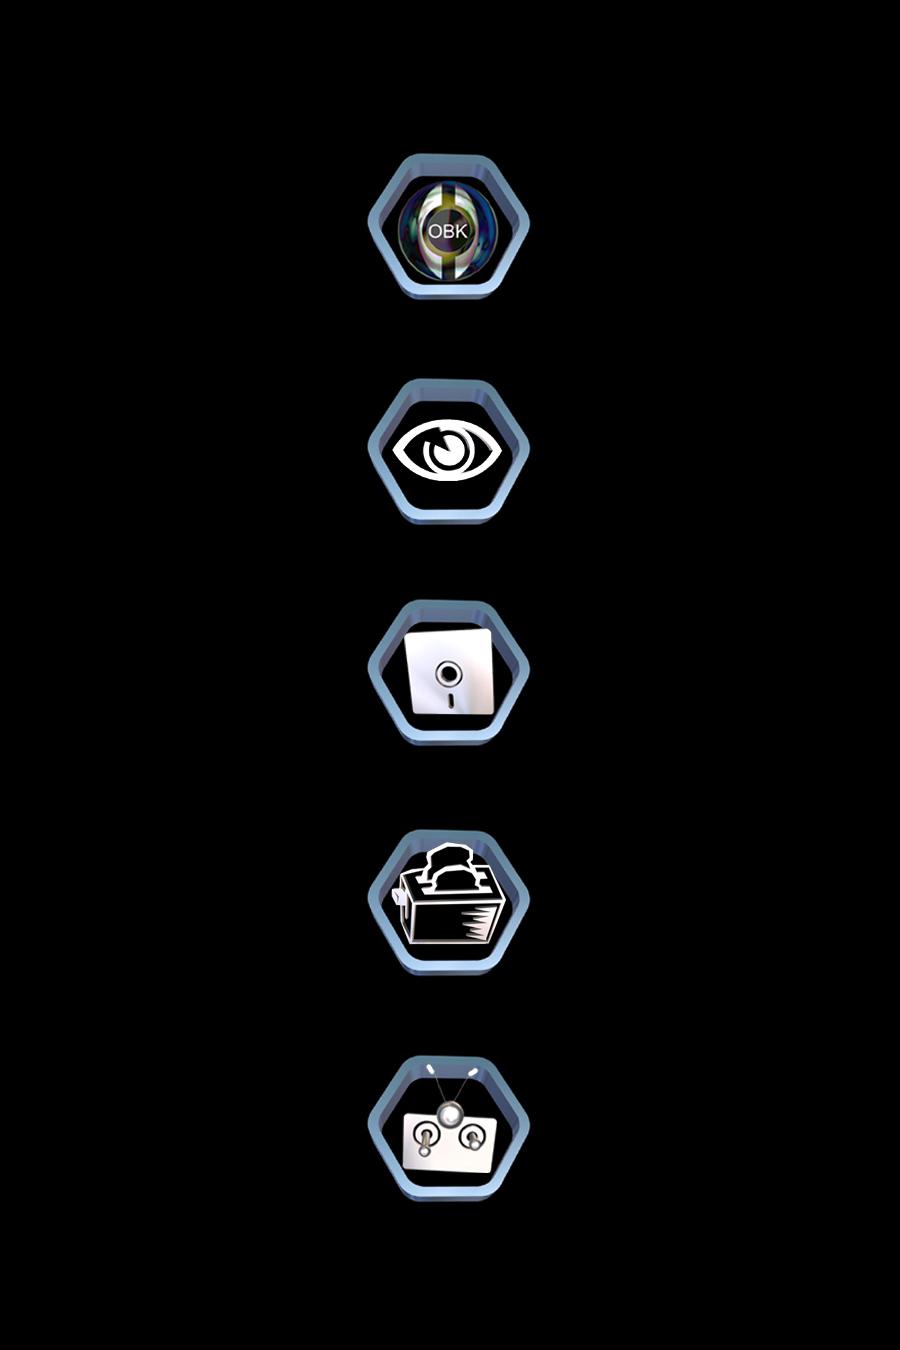 Graphic Design Sample - Icon Layout